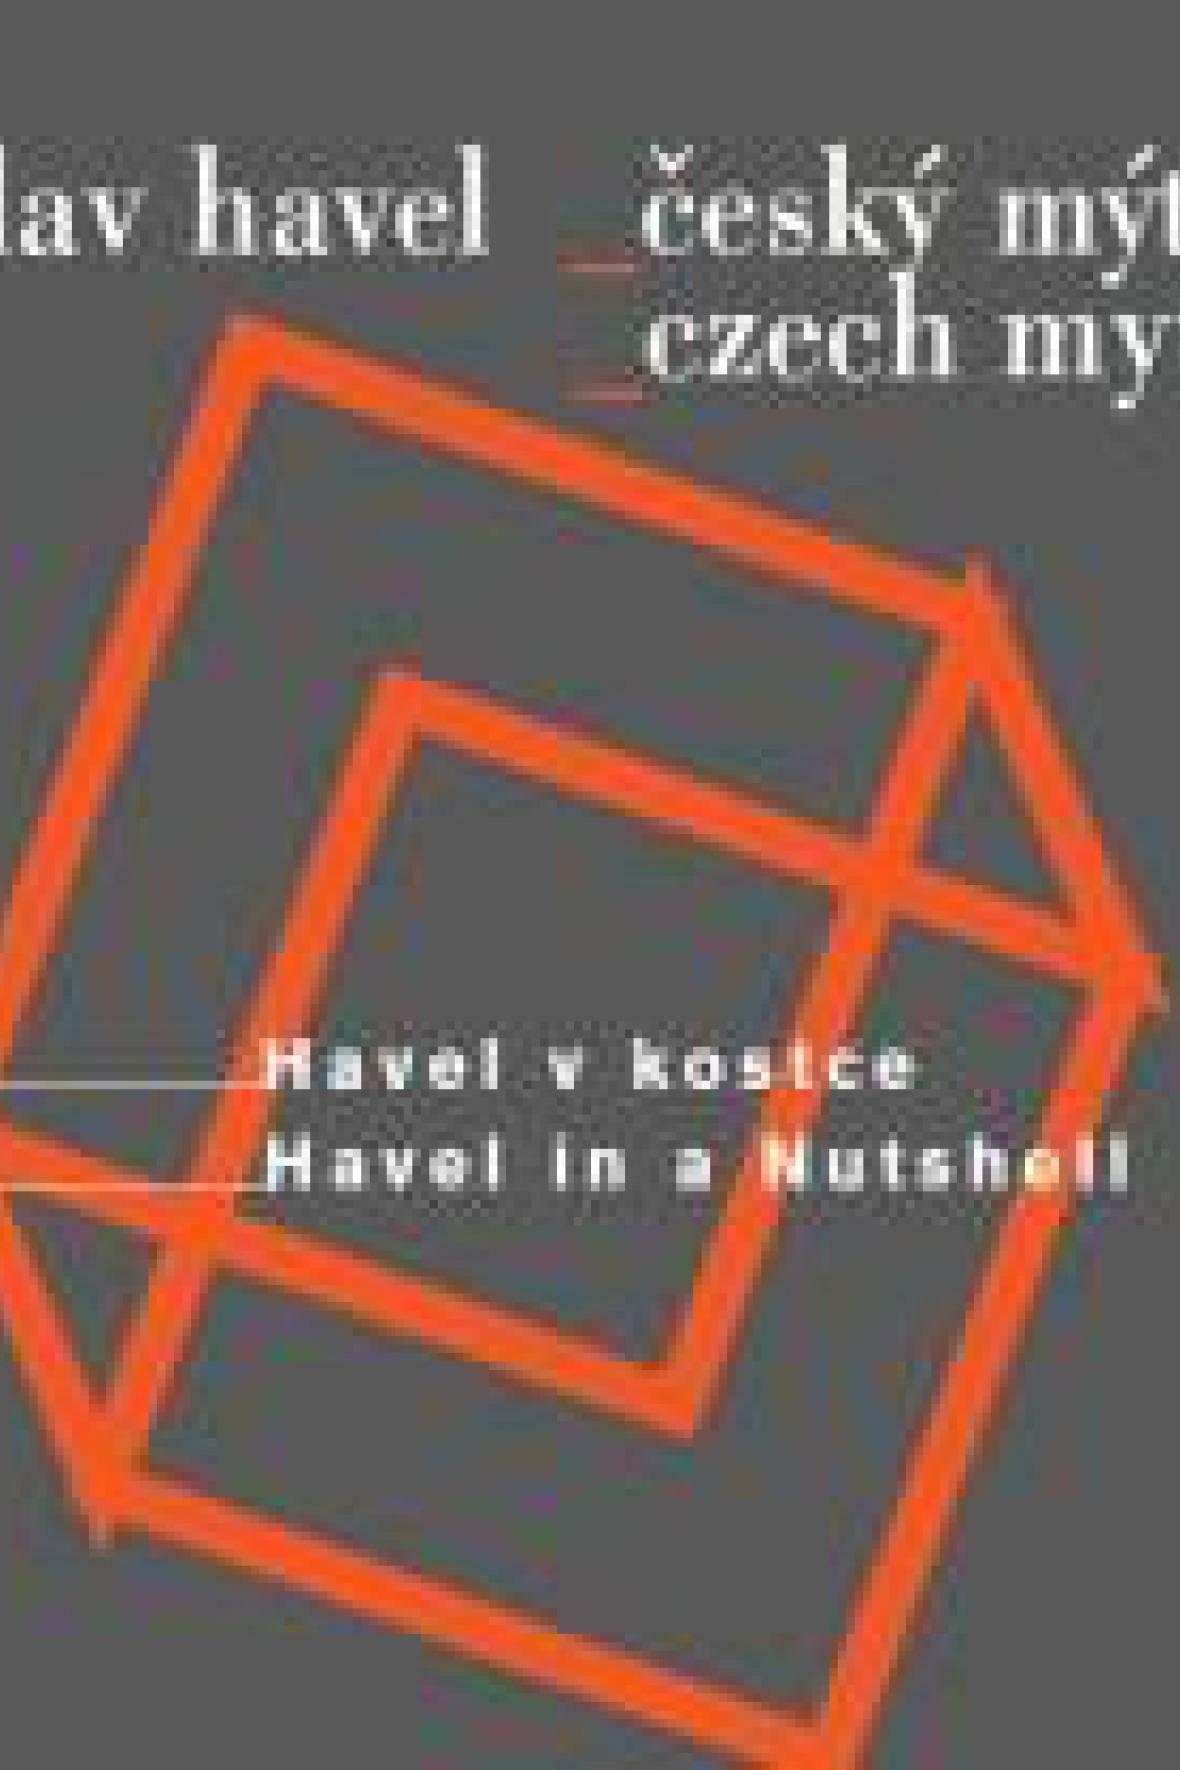 Havel v kostce